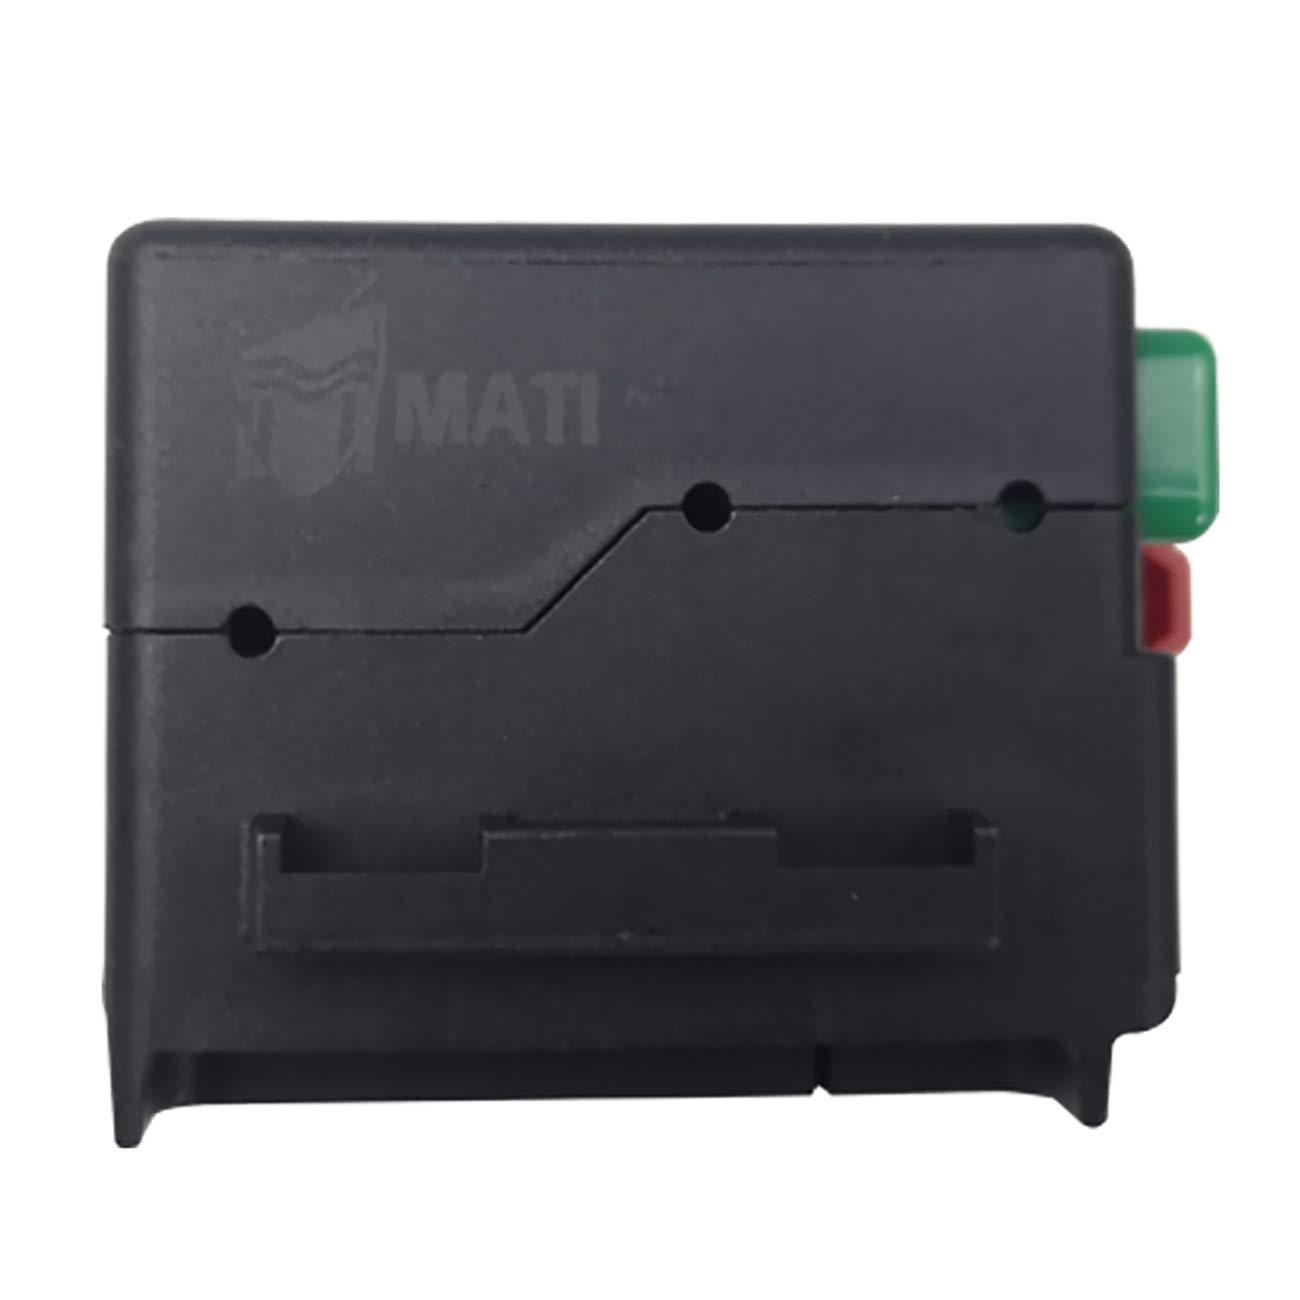 Mati Left Start Engine Run/Off Headlight HI LO Off Handlebar Switch for Polaris Predator 500 Outlaw 450 Outlaw 500 Outlaw 525 4011442 4011387 4010594